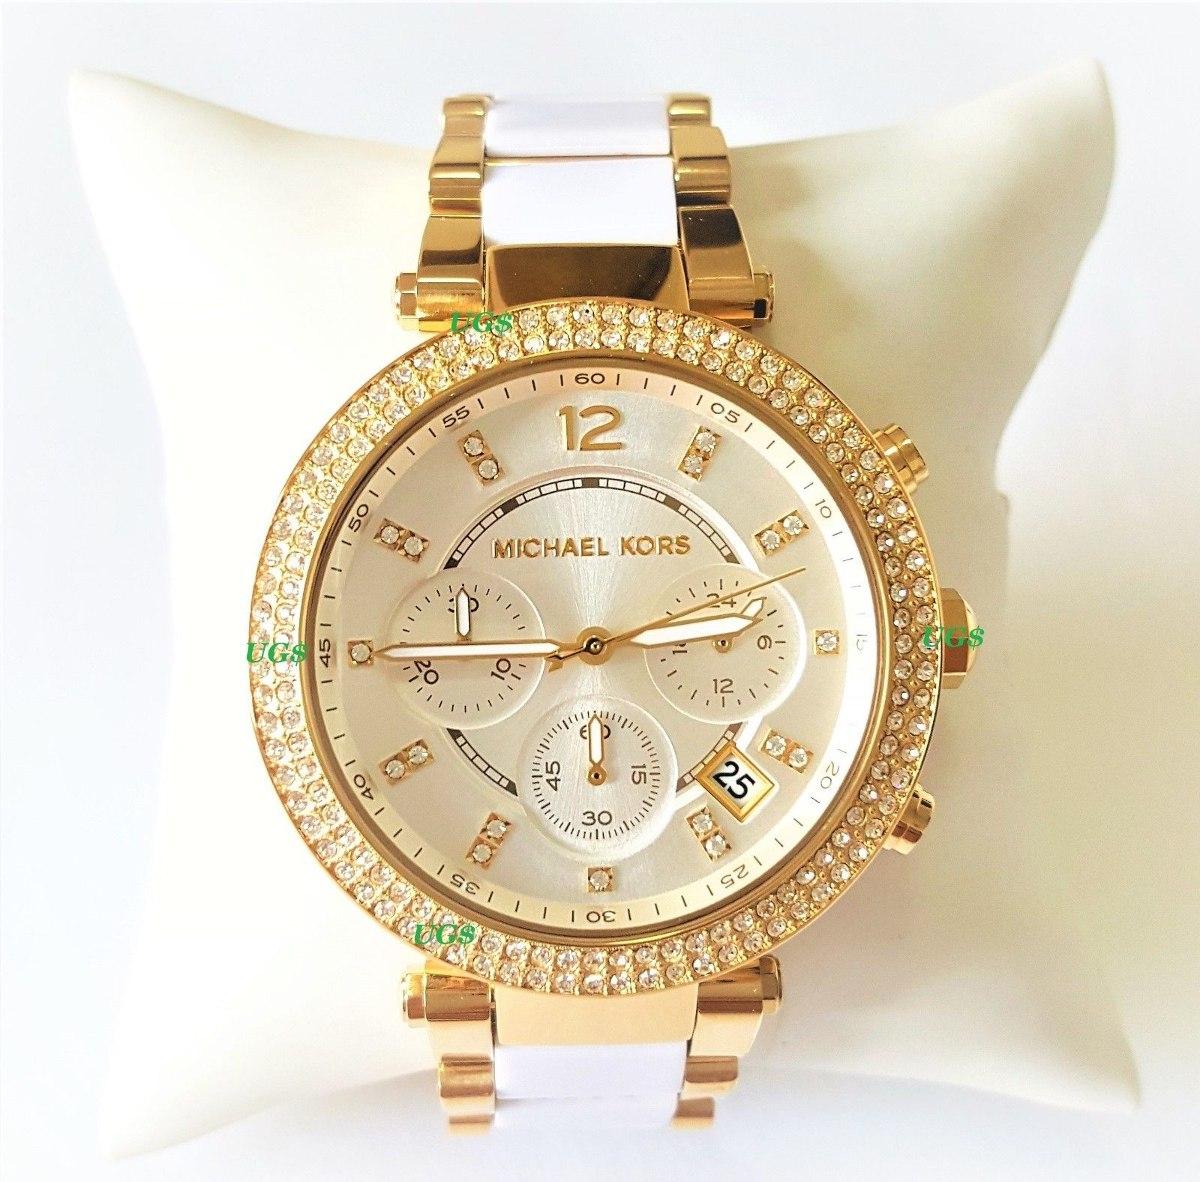 fb4cacfe588b reloj mujer michael kors parker oro blanco banda acetato bla. Cargando zoom.